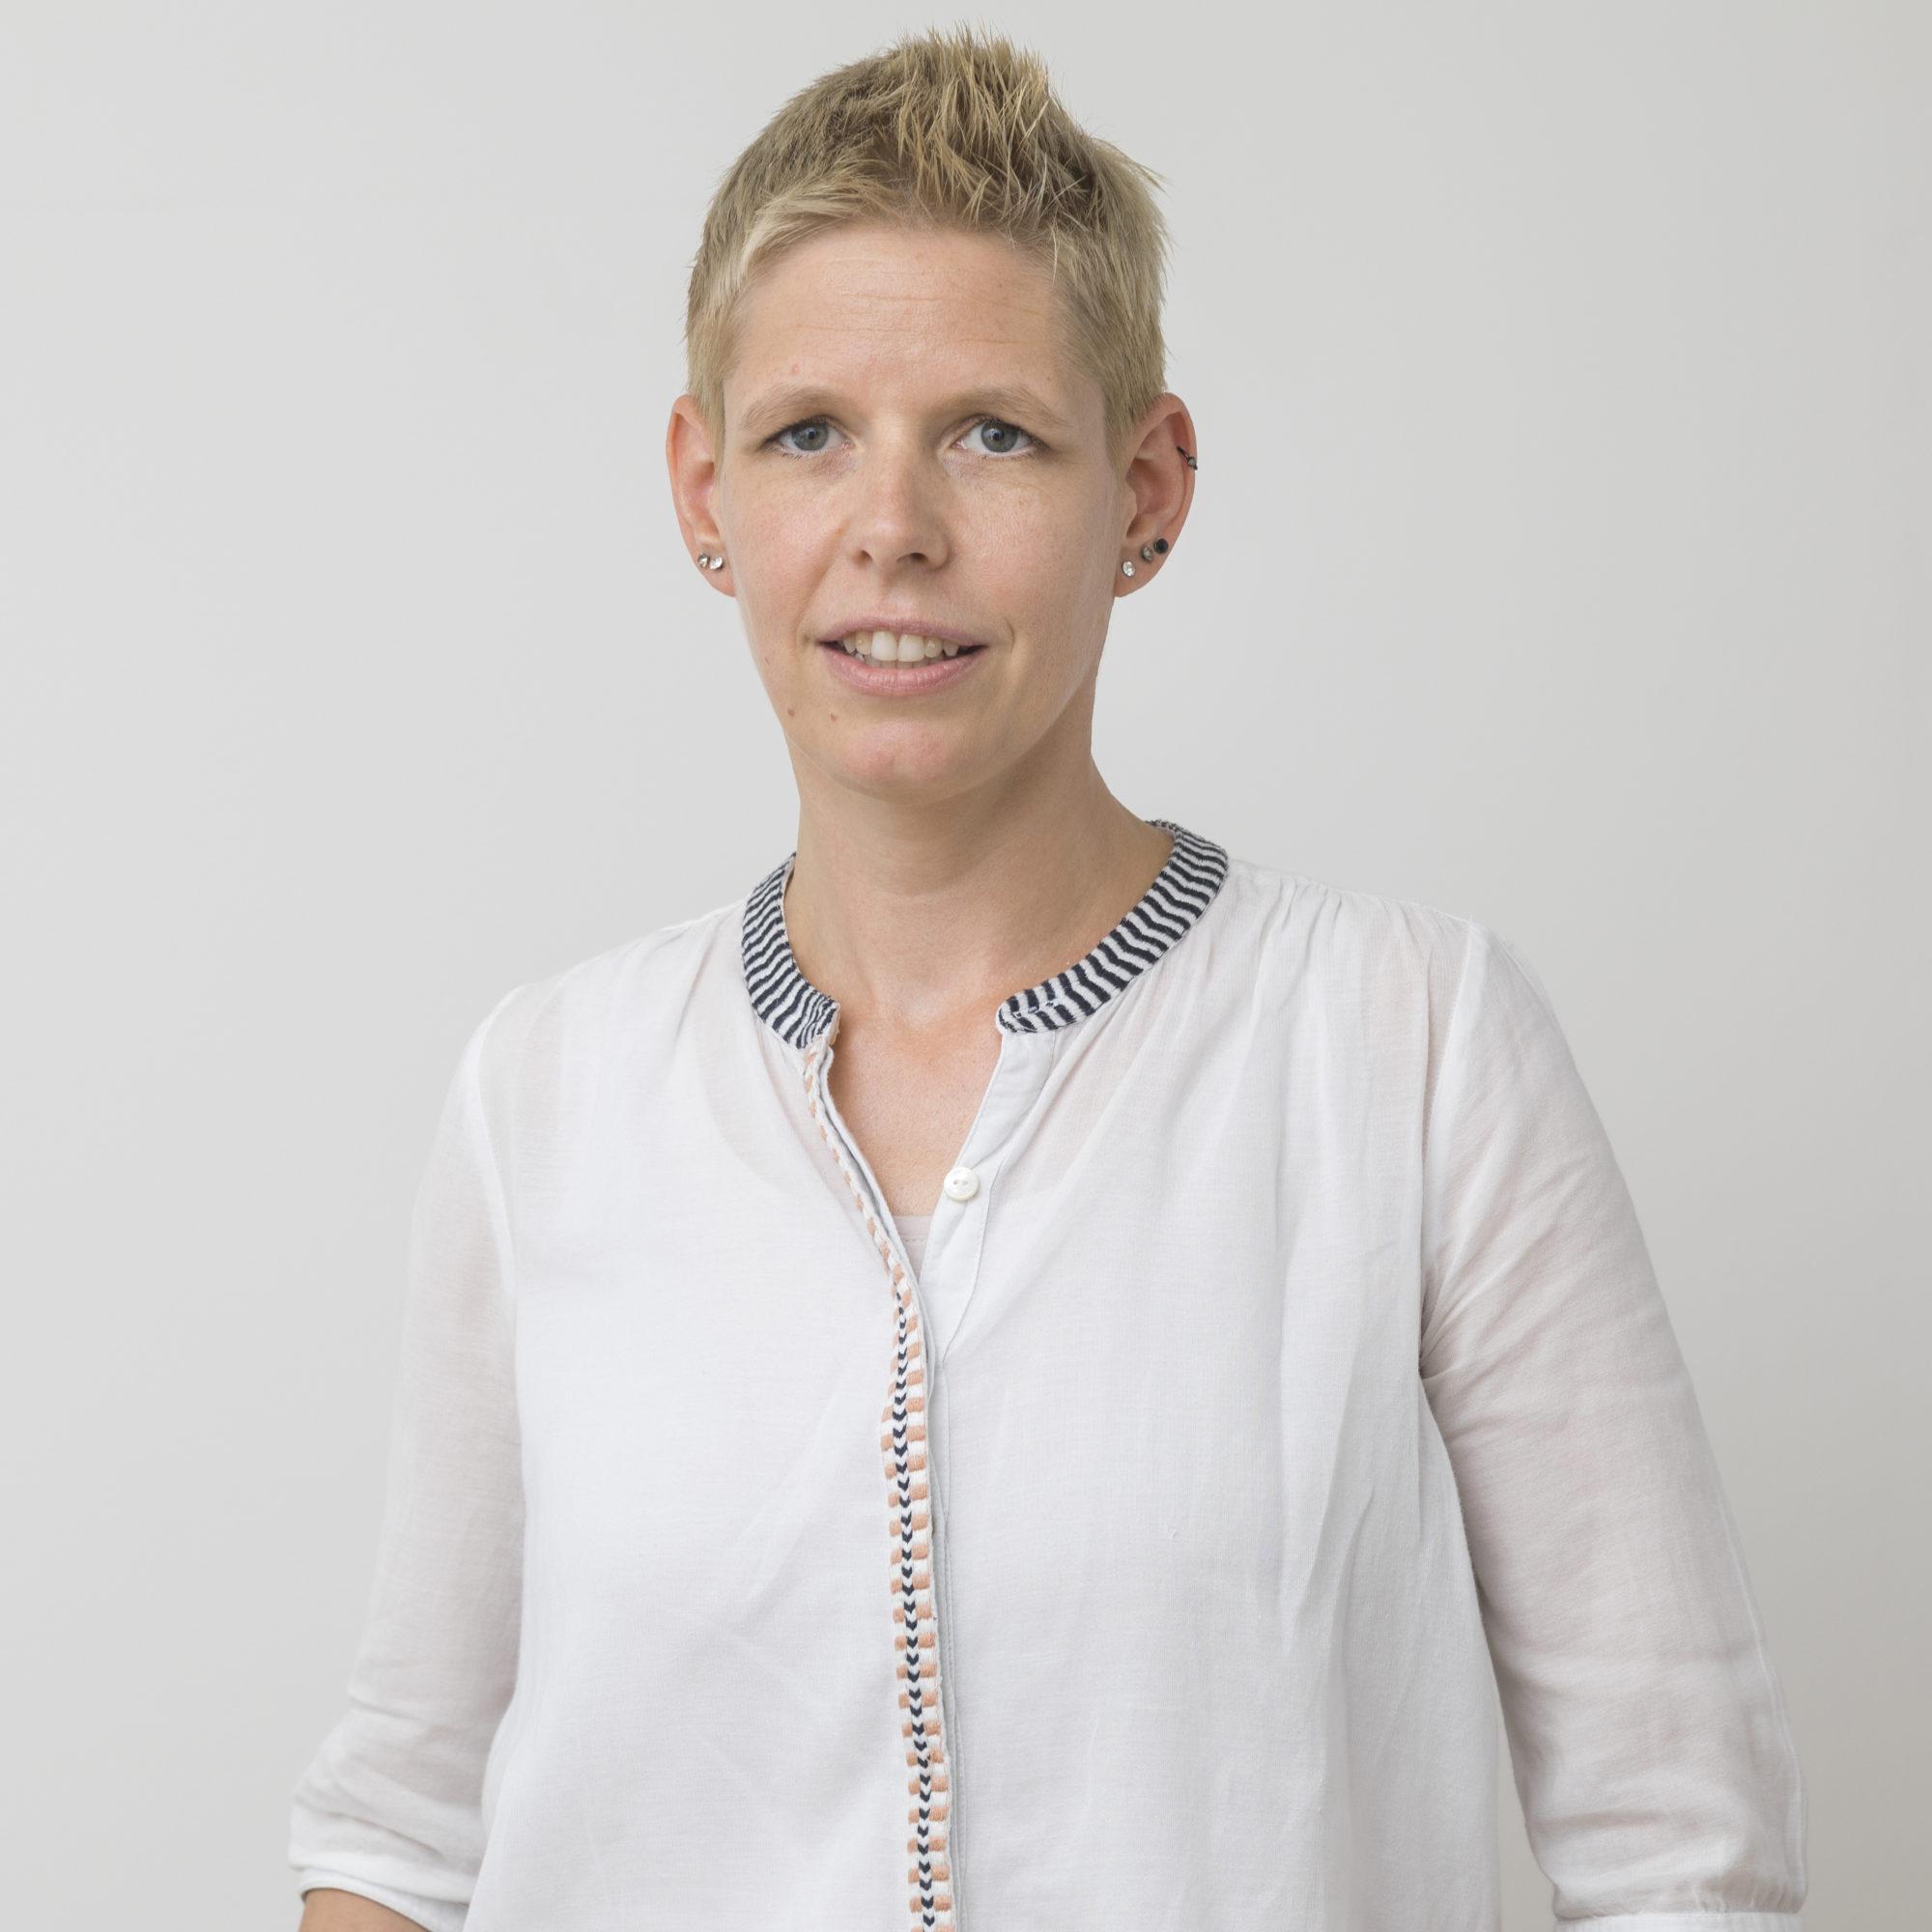 Chantal Rossi